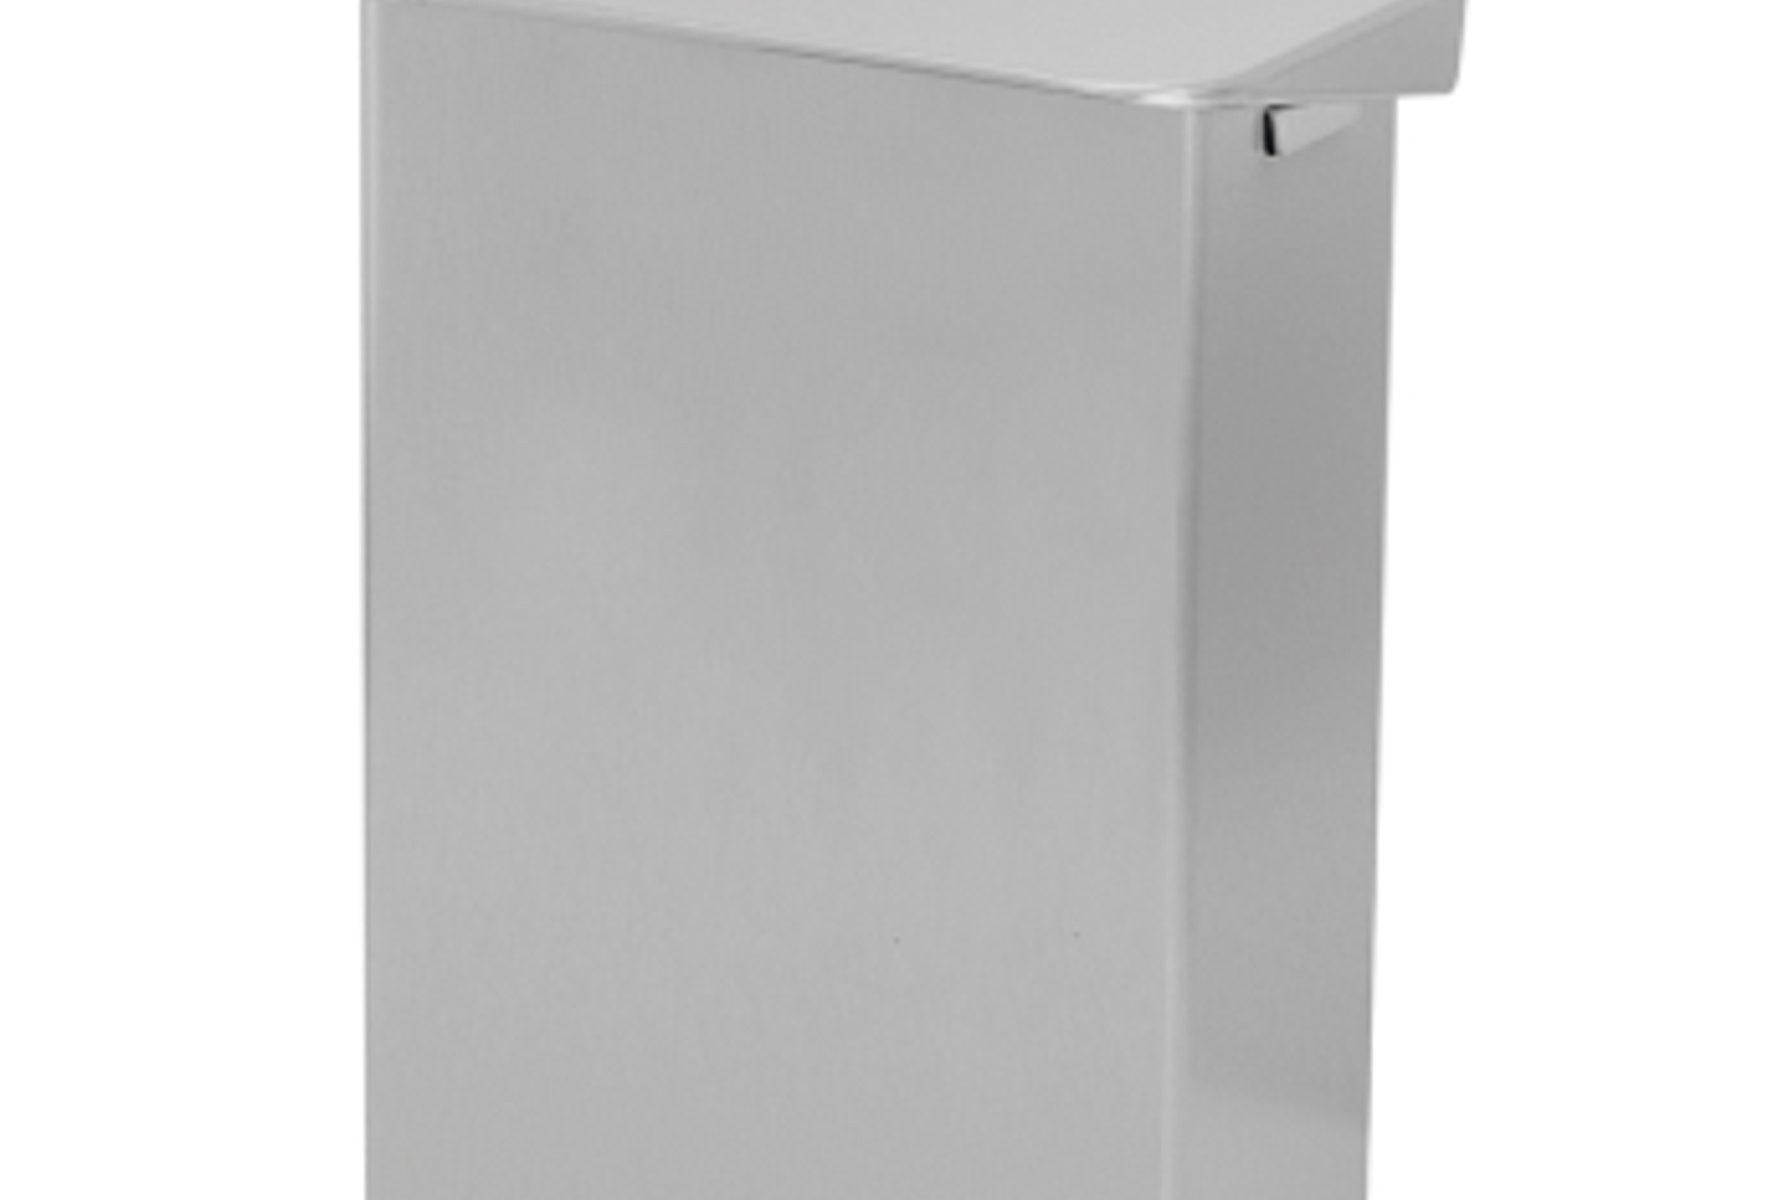 865721 Edelstahl Hygiene-Abfallsammler mit Deckel 6L